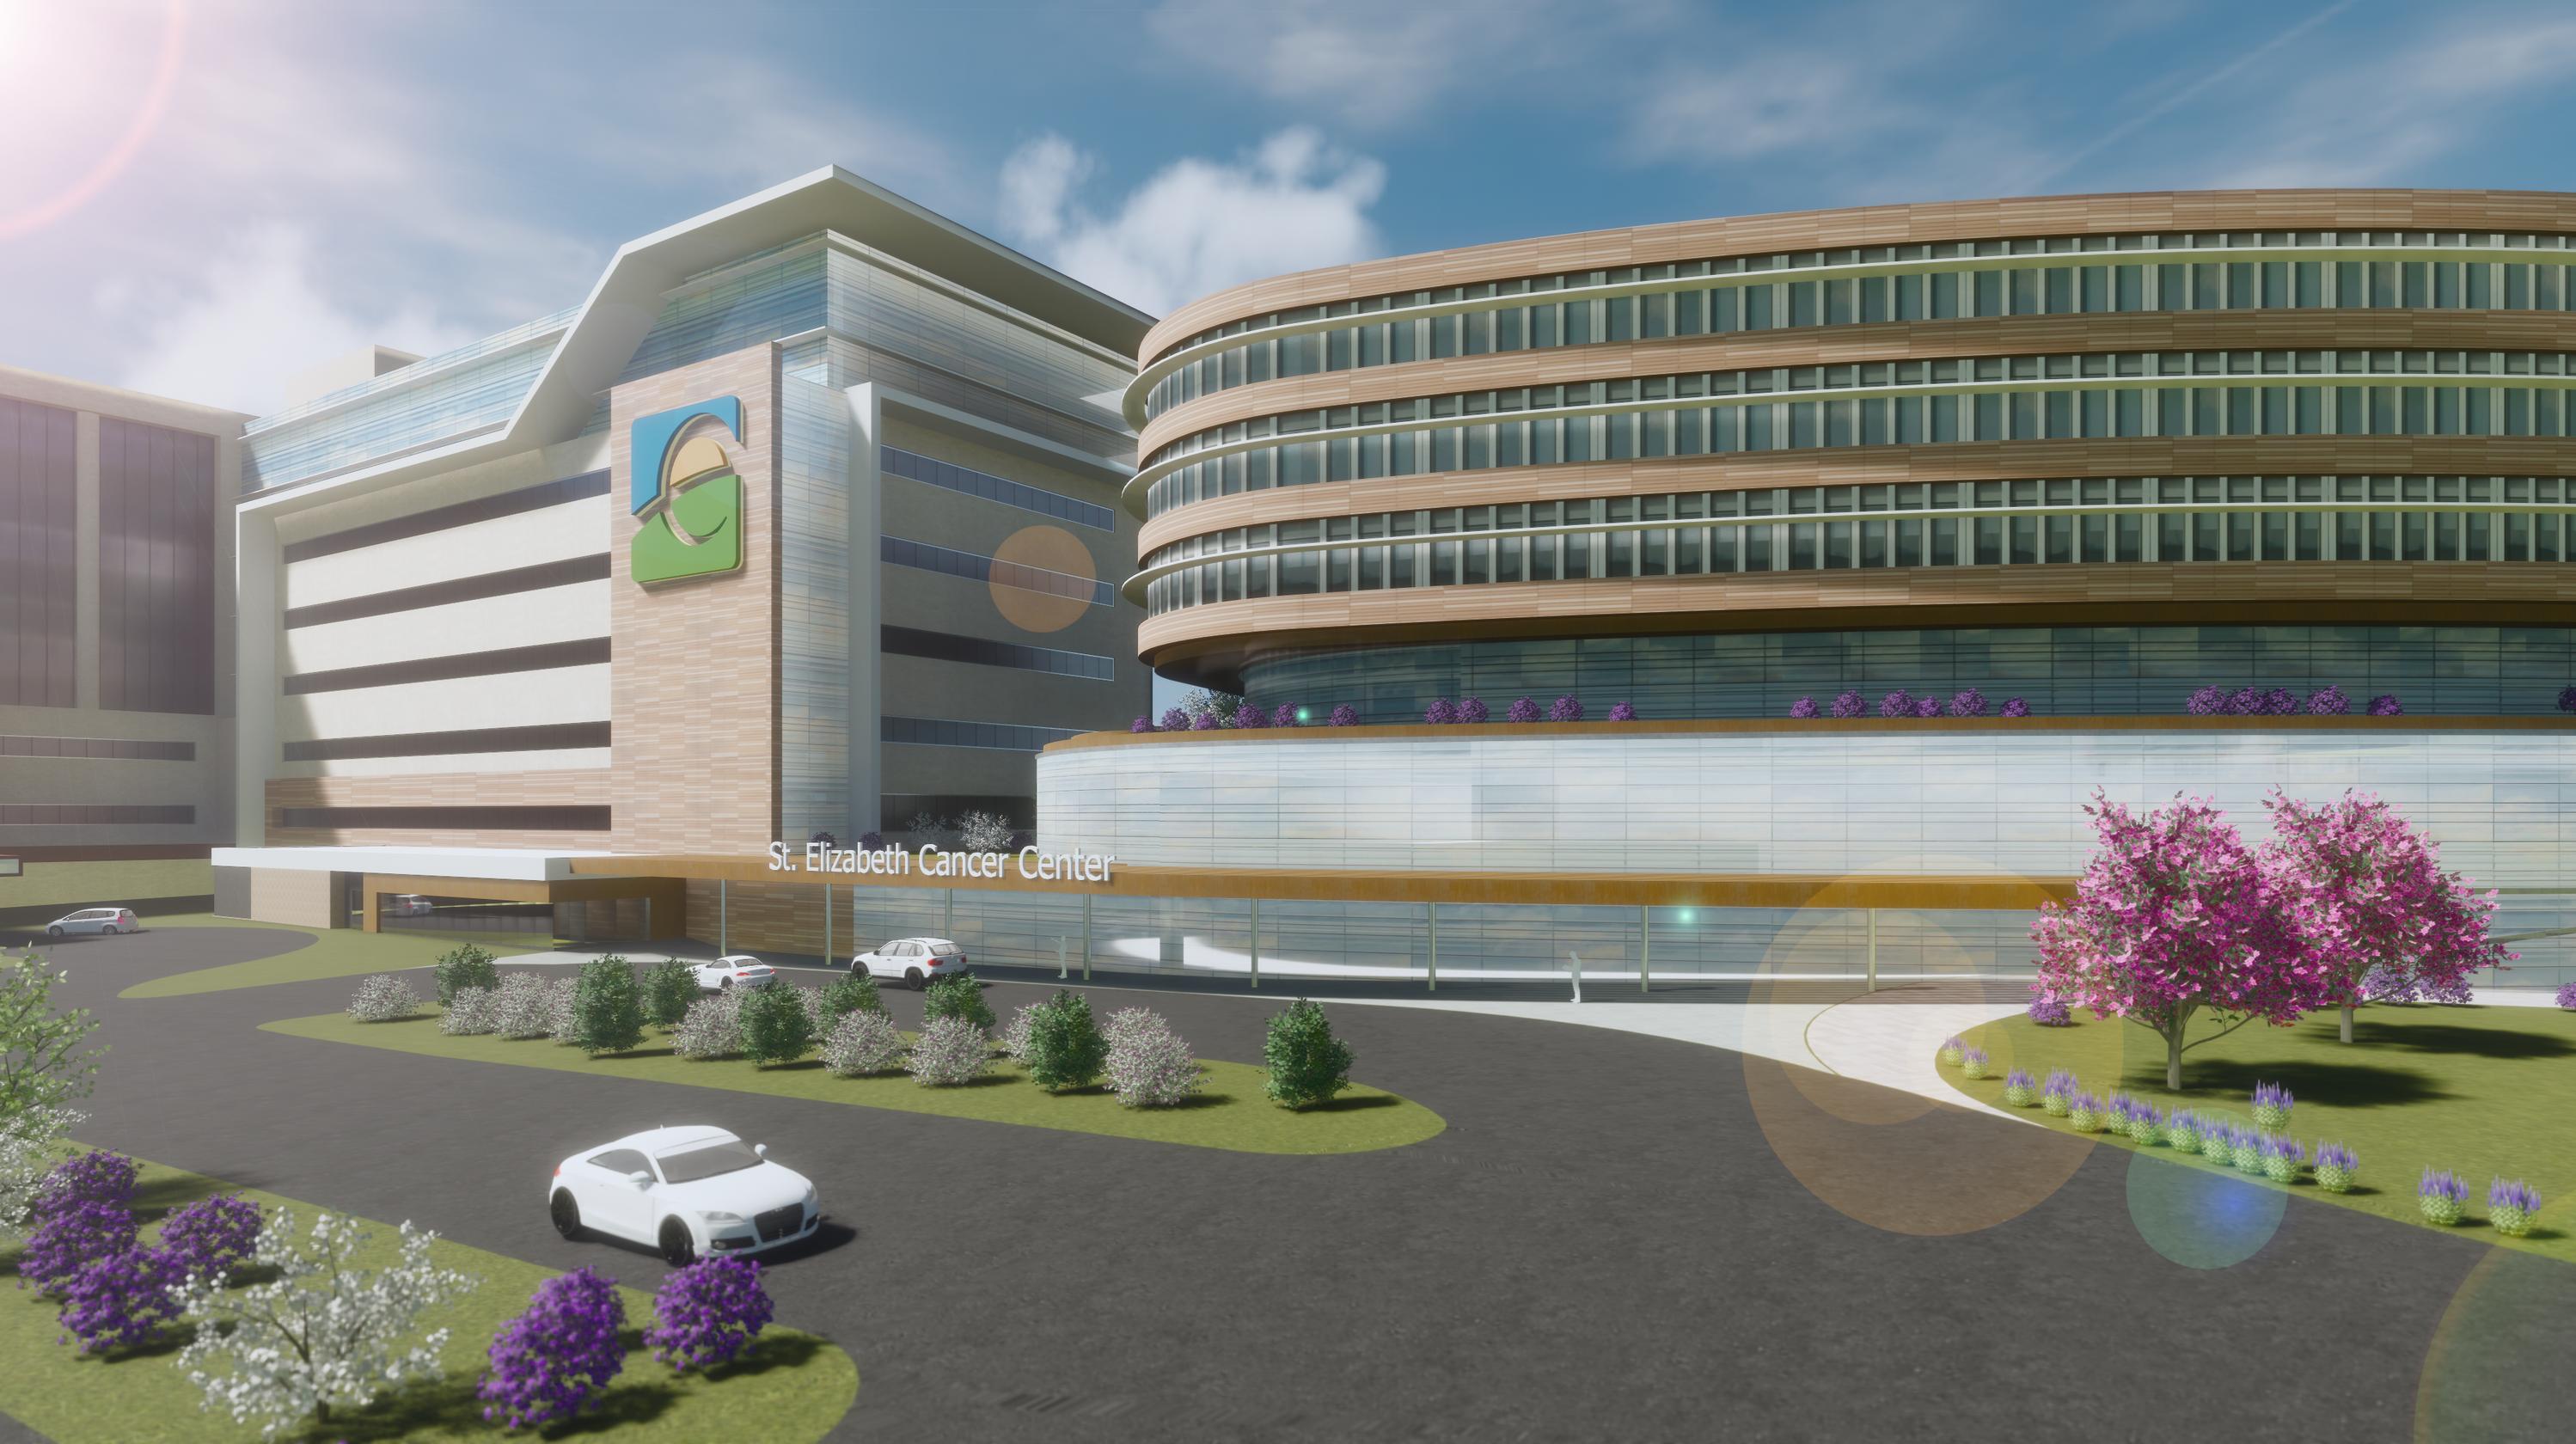 Expanding care: St  Elizabeth Cancer Center breaks ground